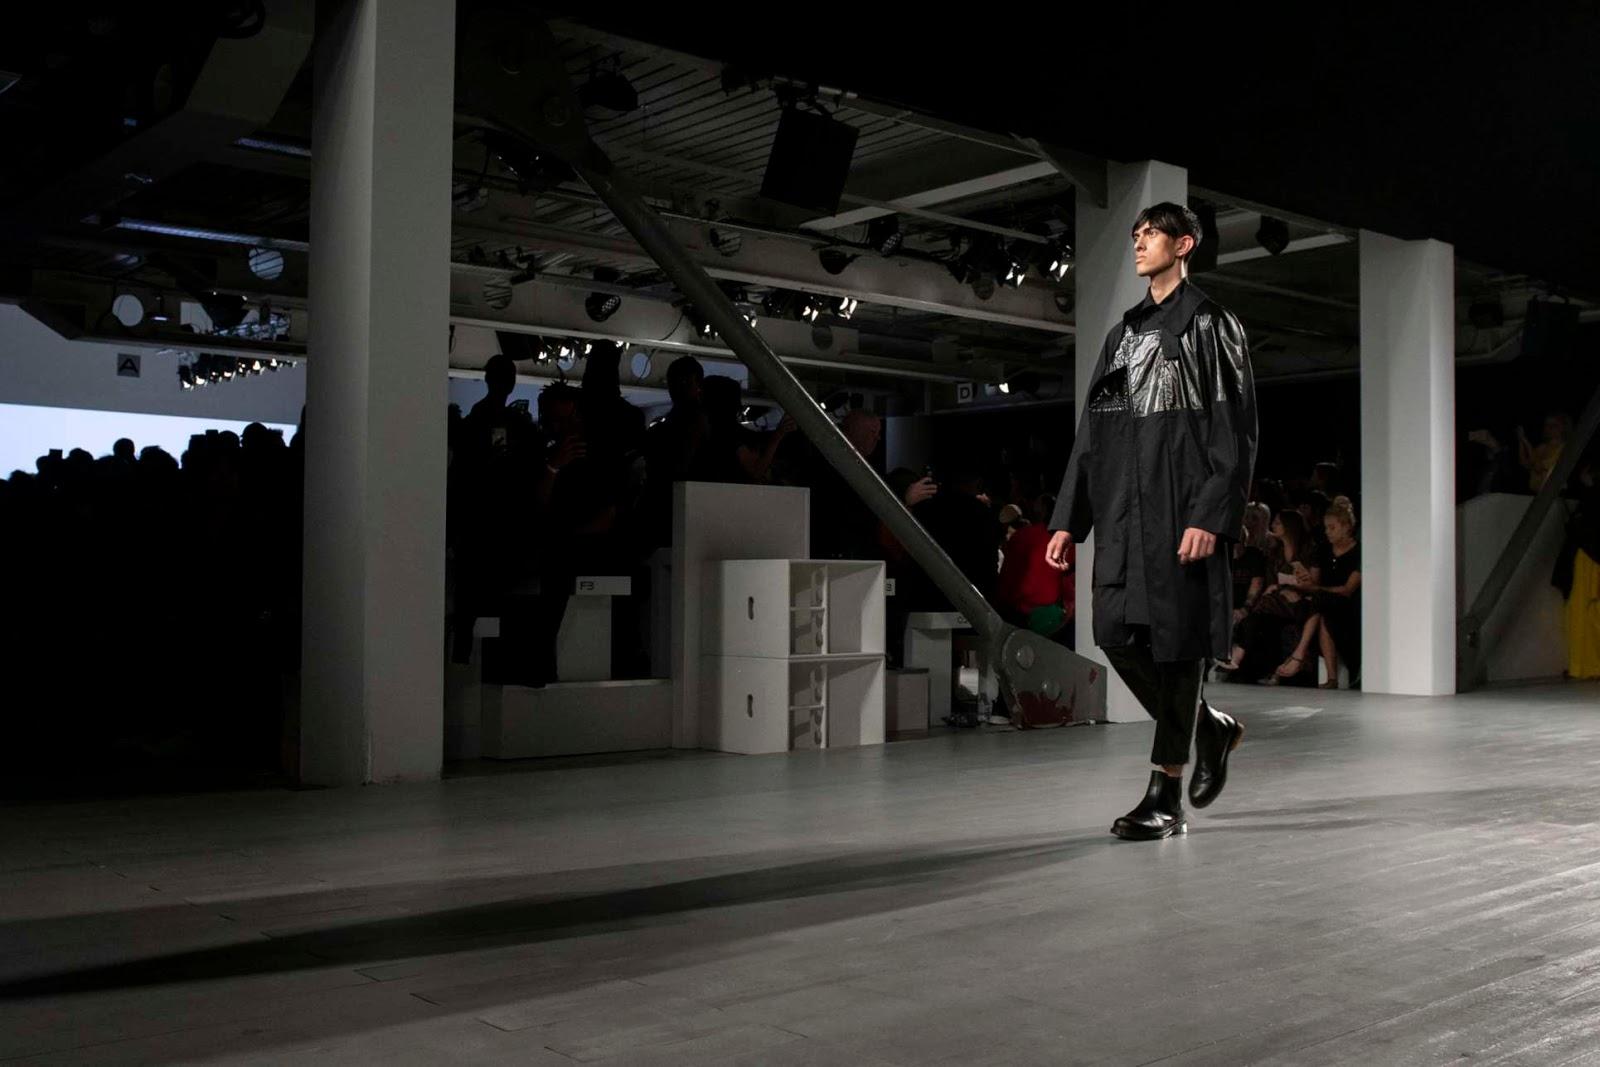 London Fashion Week - Home 25